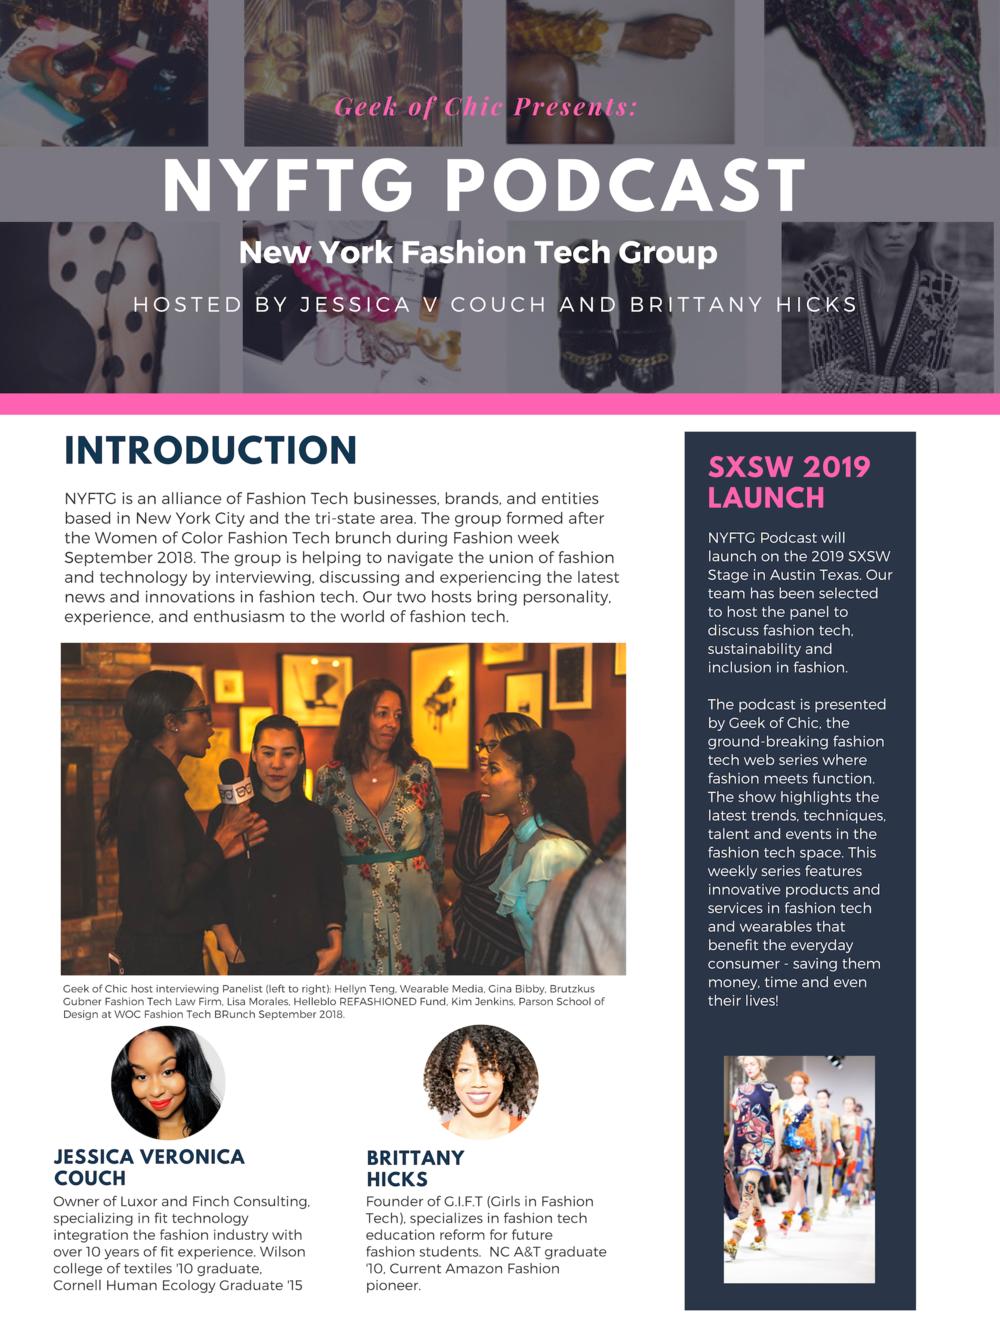 NYFTG Podcast